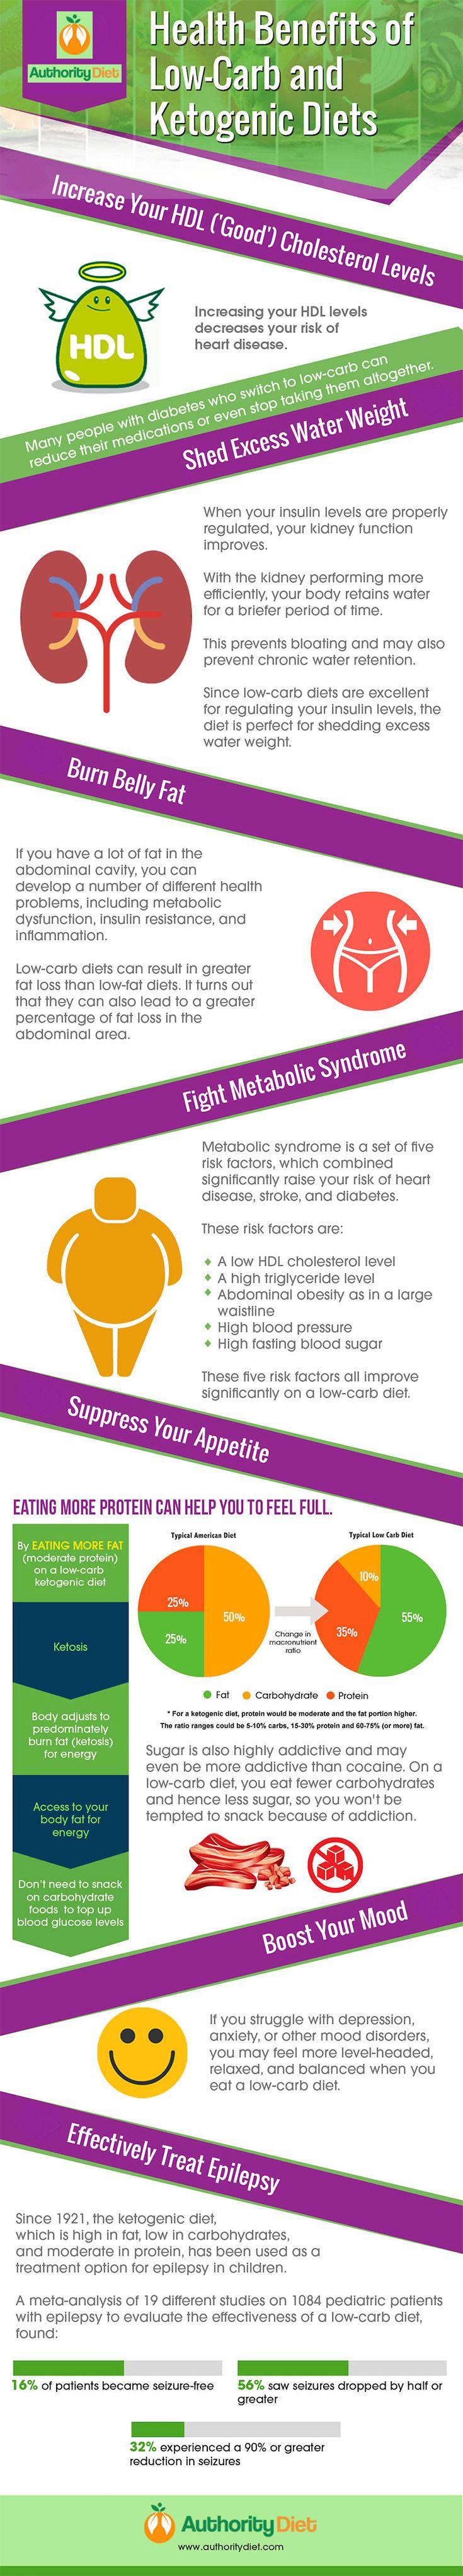 Atkins Diet: How It Works, Health Benefits, Plus Precautions